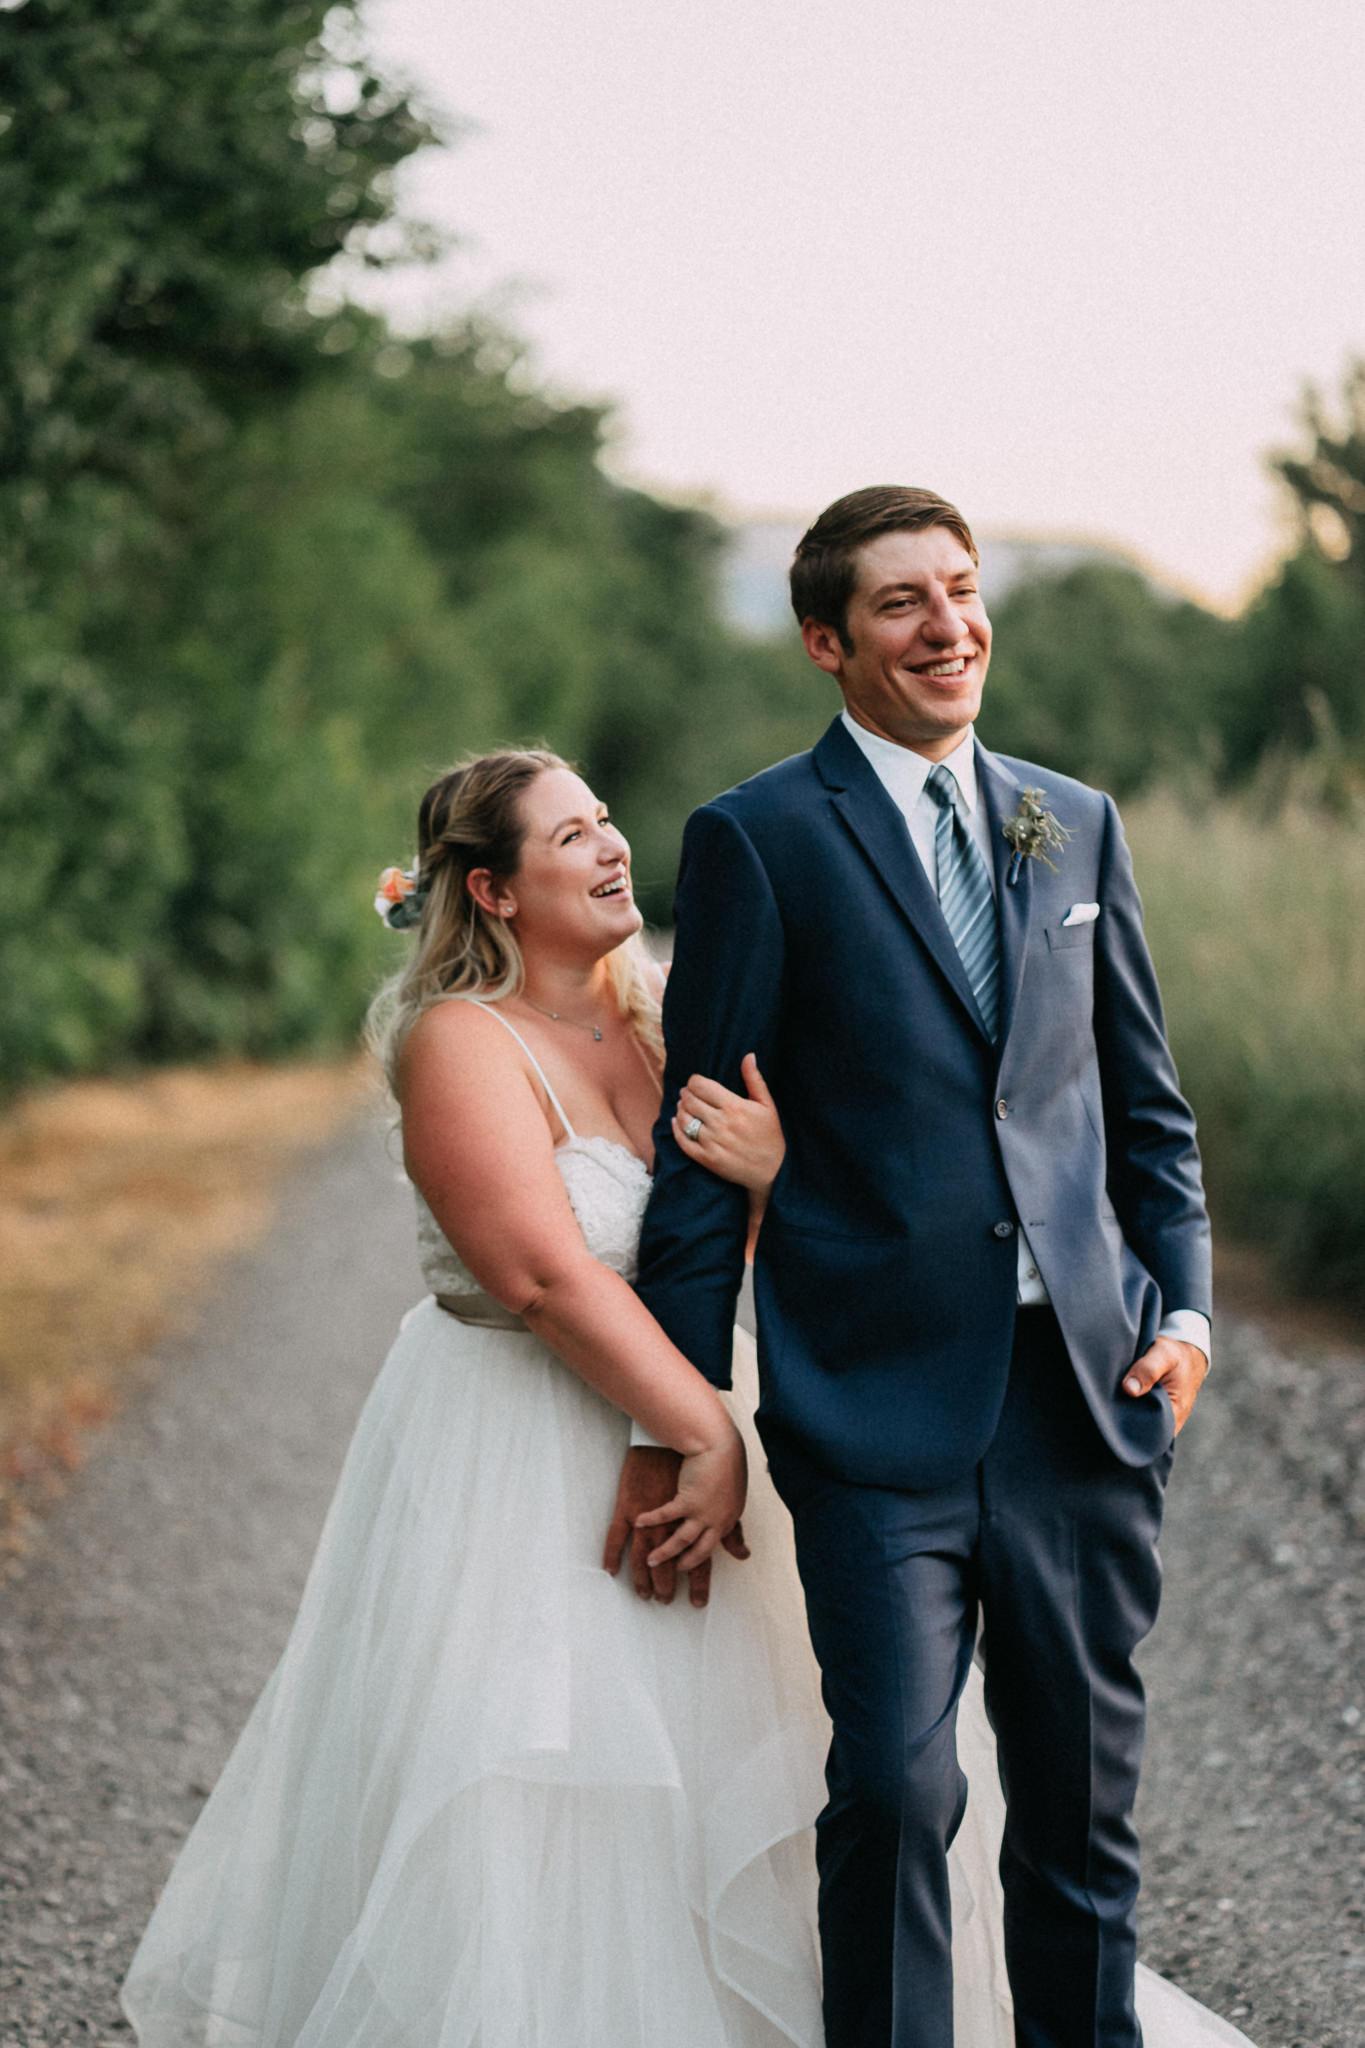 Bride Groom Formal Portrait unposed Candid Portland Wedding Cascade Locks